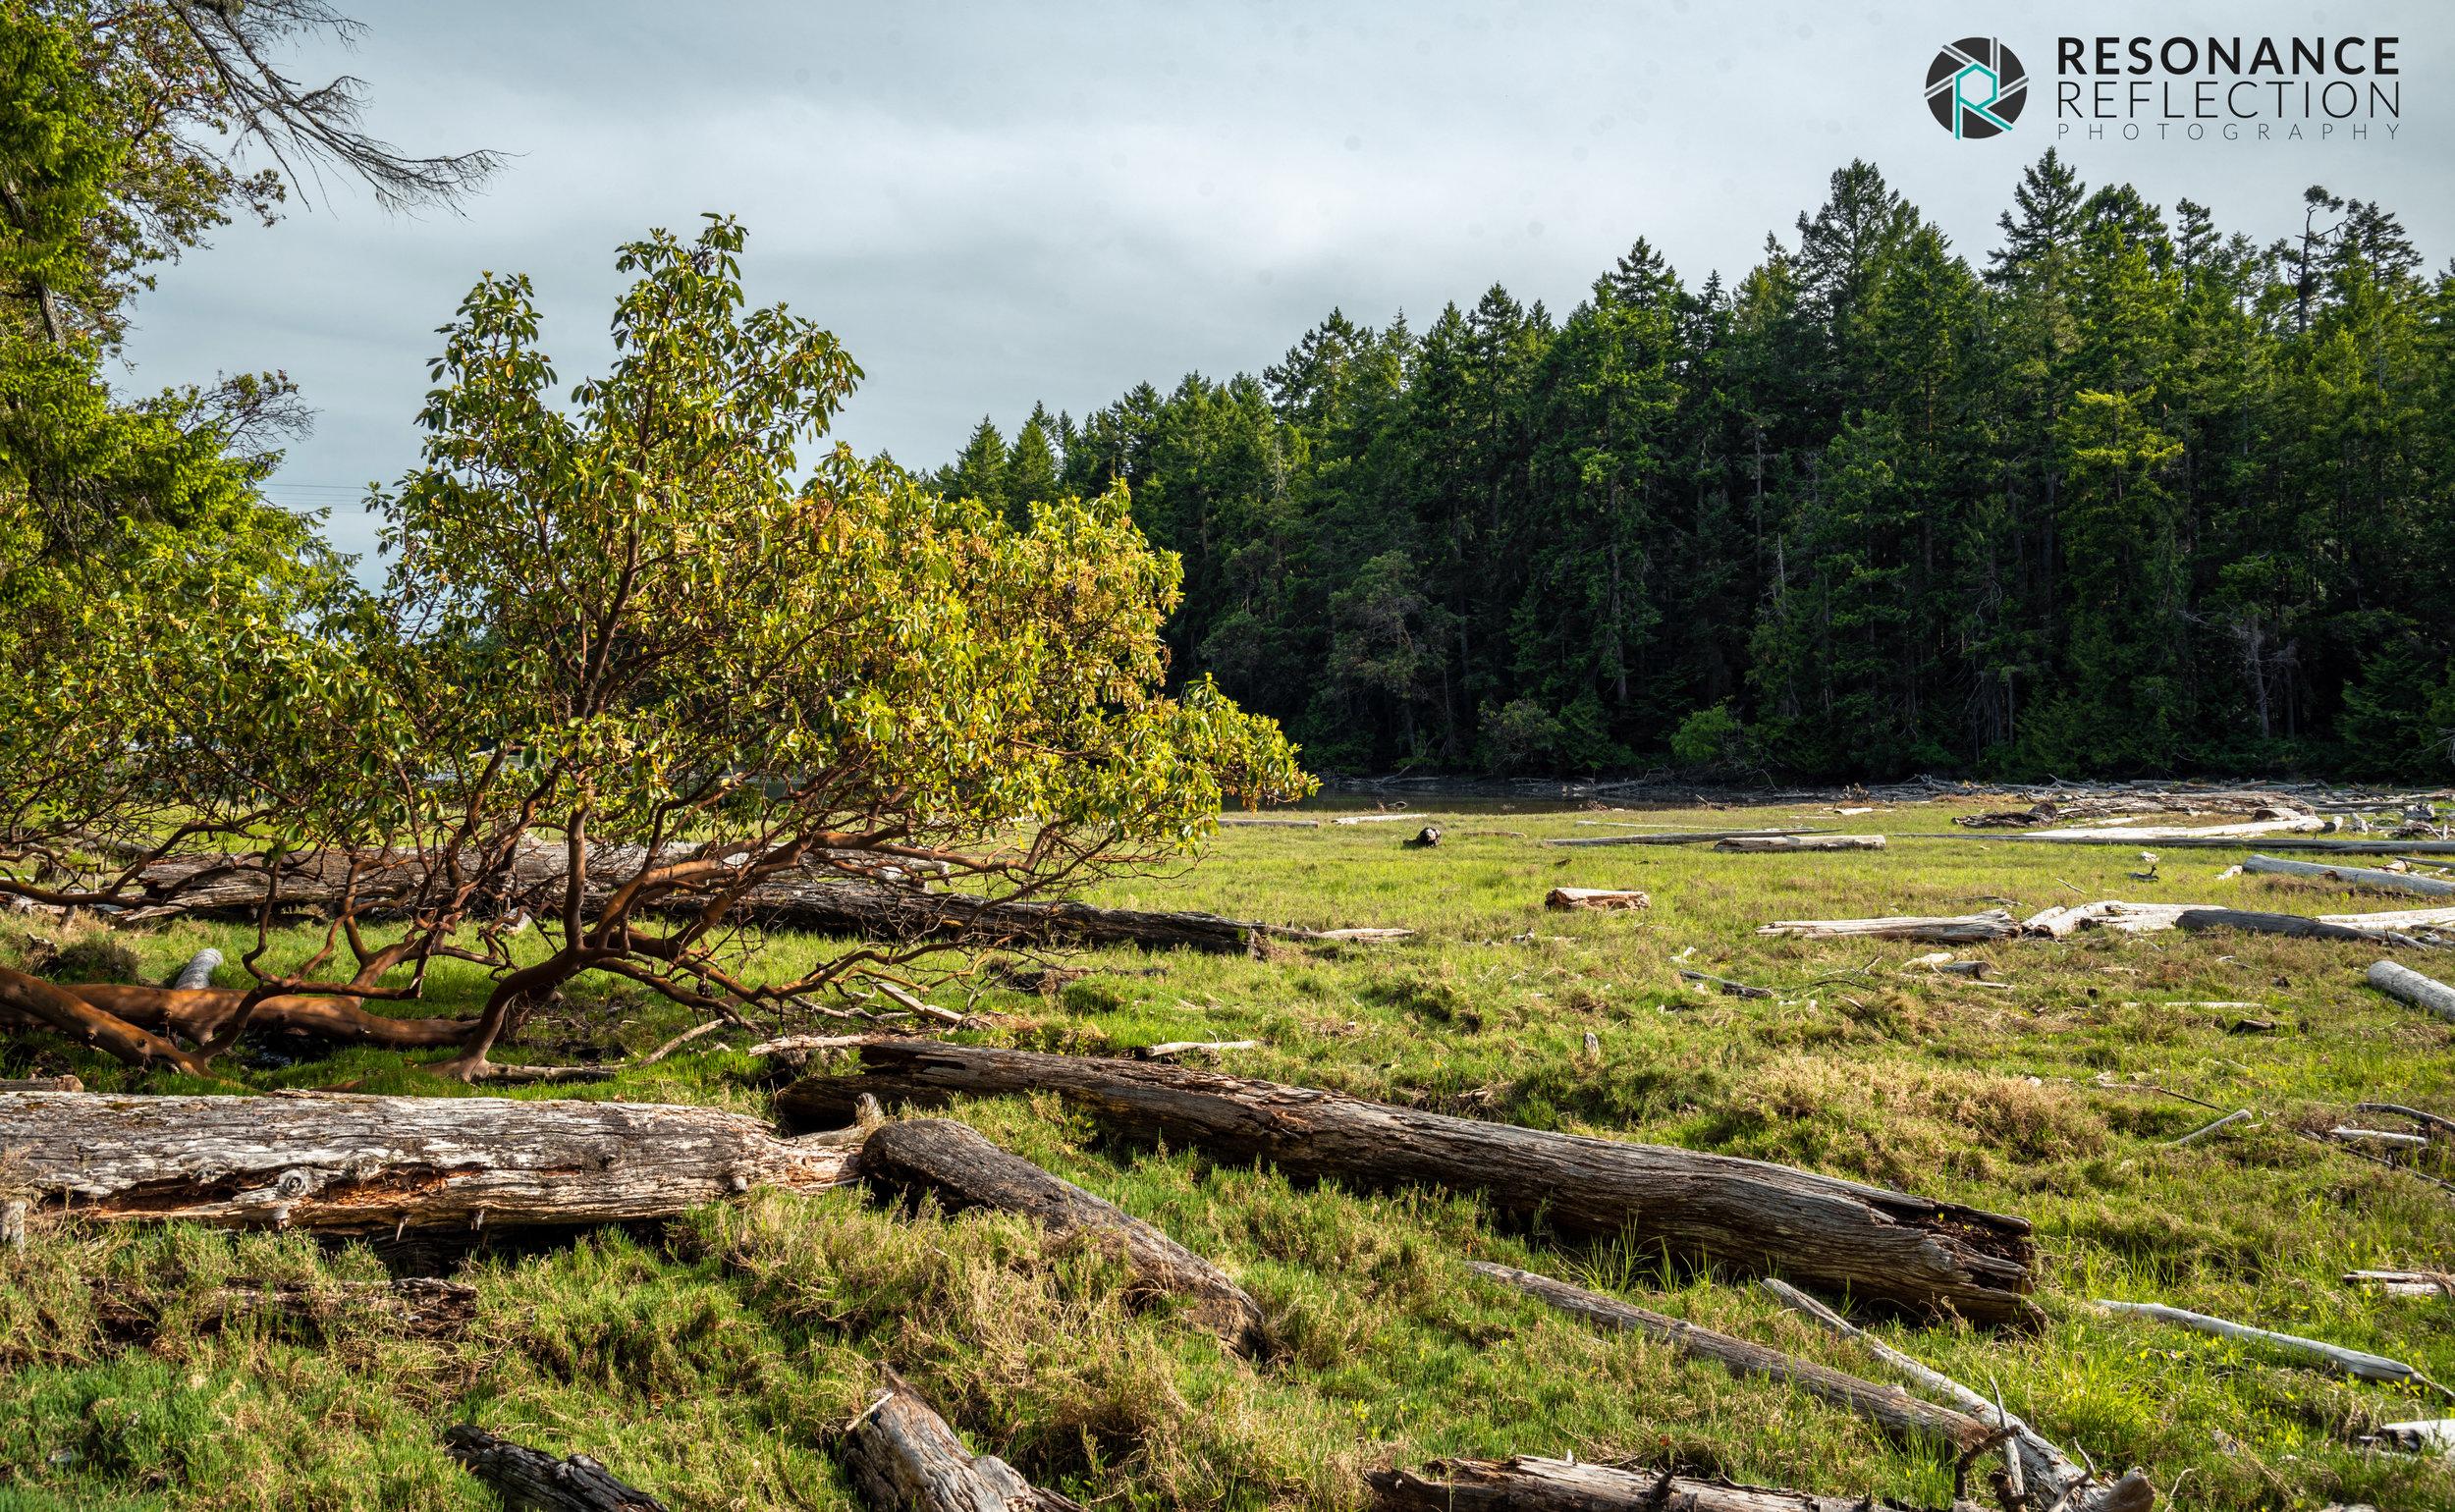 montague forest.jpg